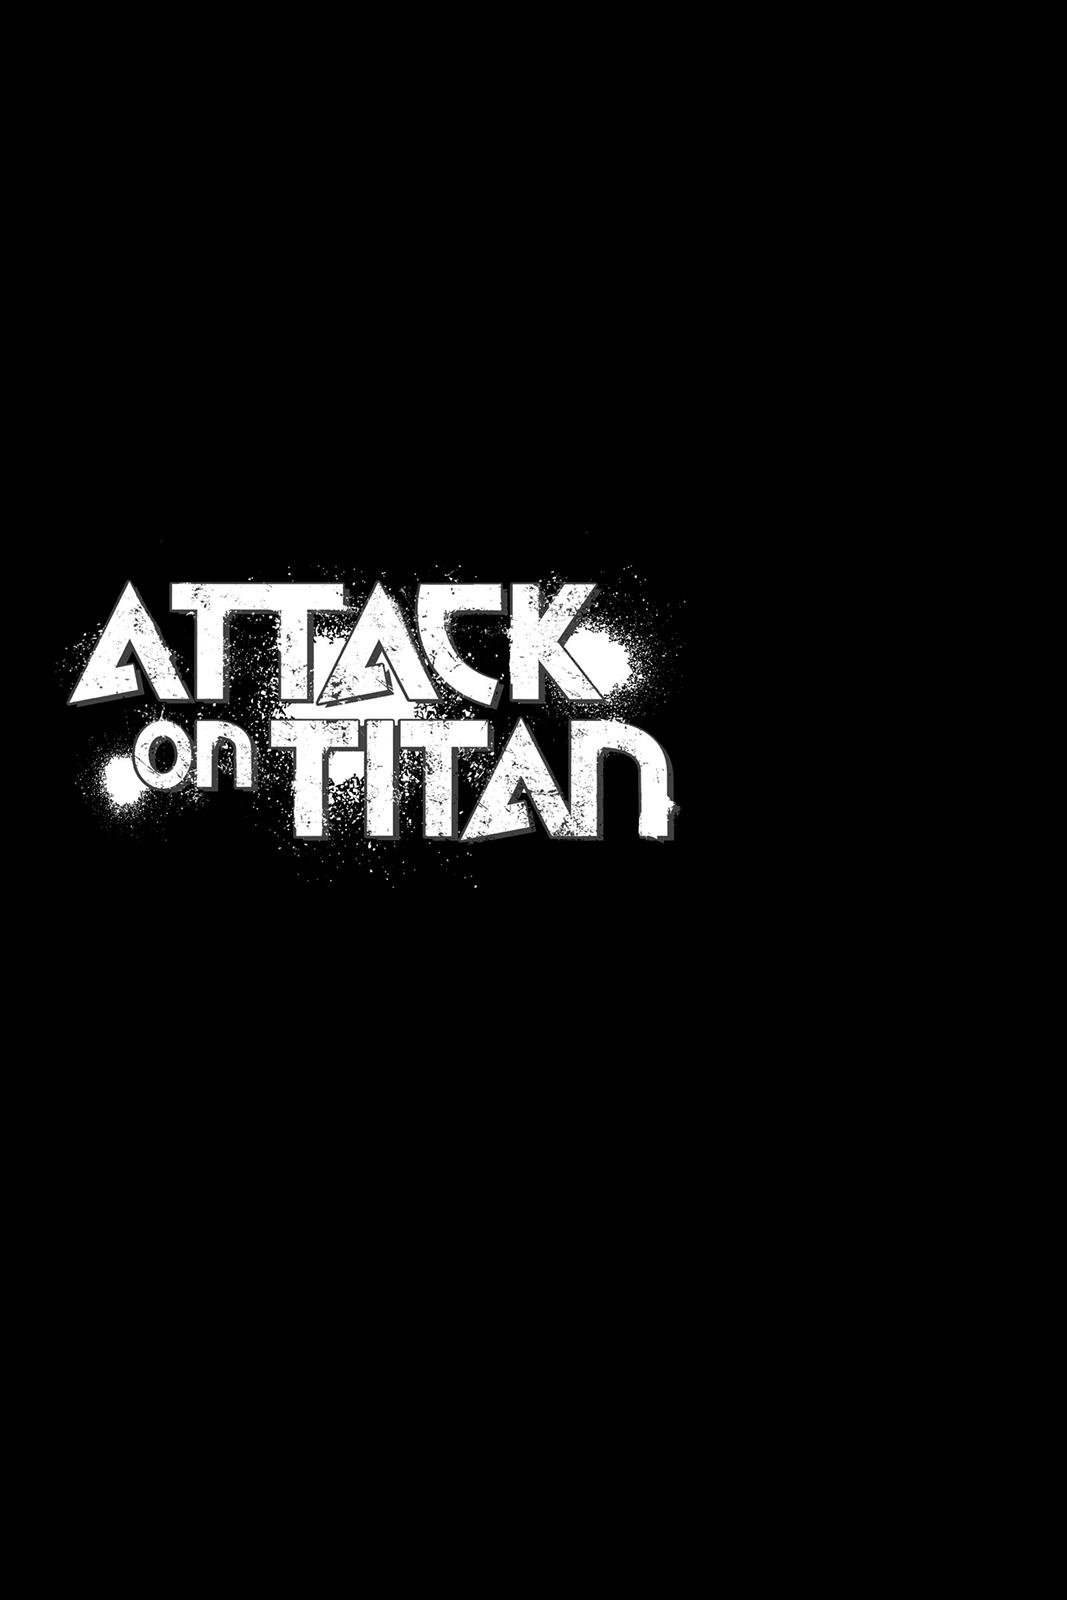 Attack On Titan, Episode 97 image 046